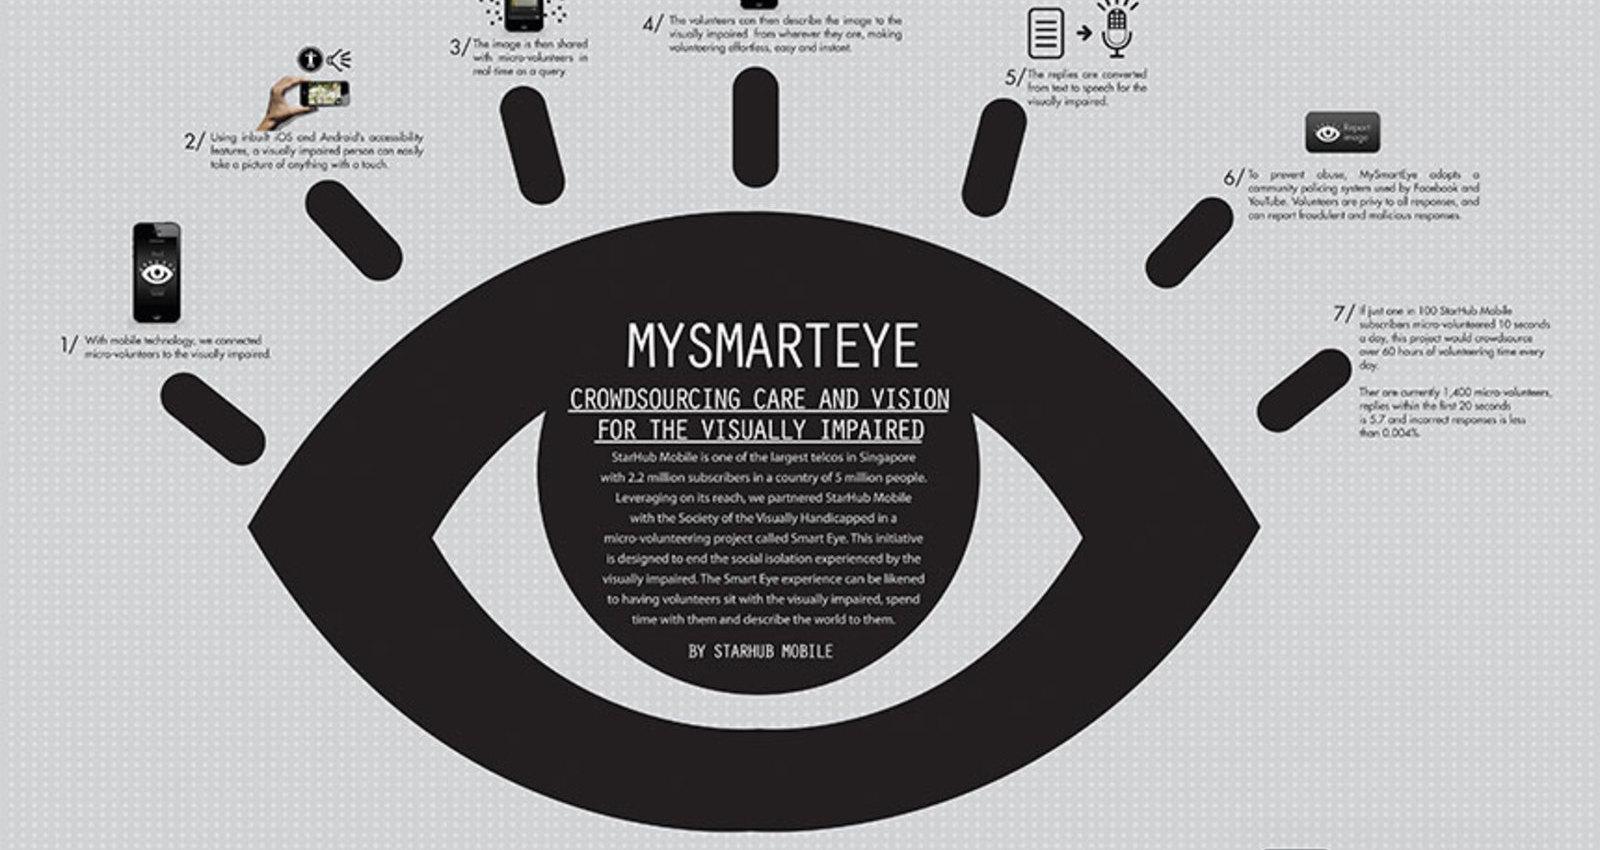 MySmartEye